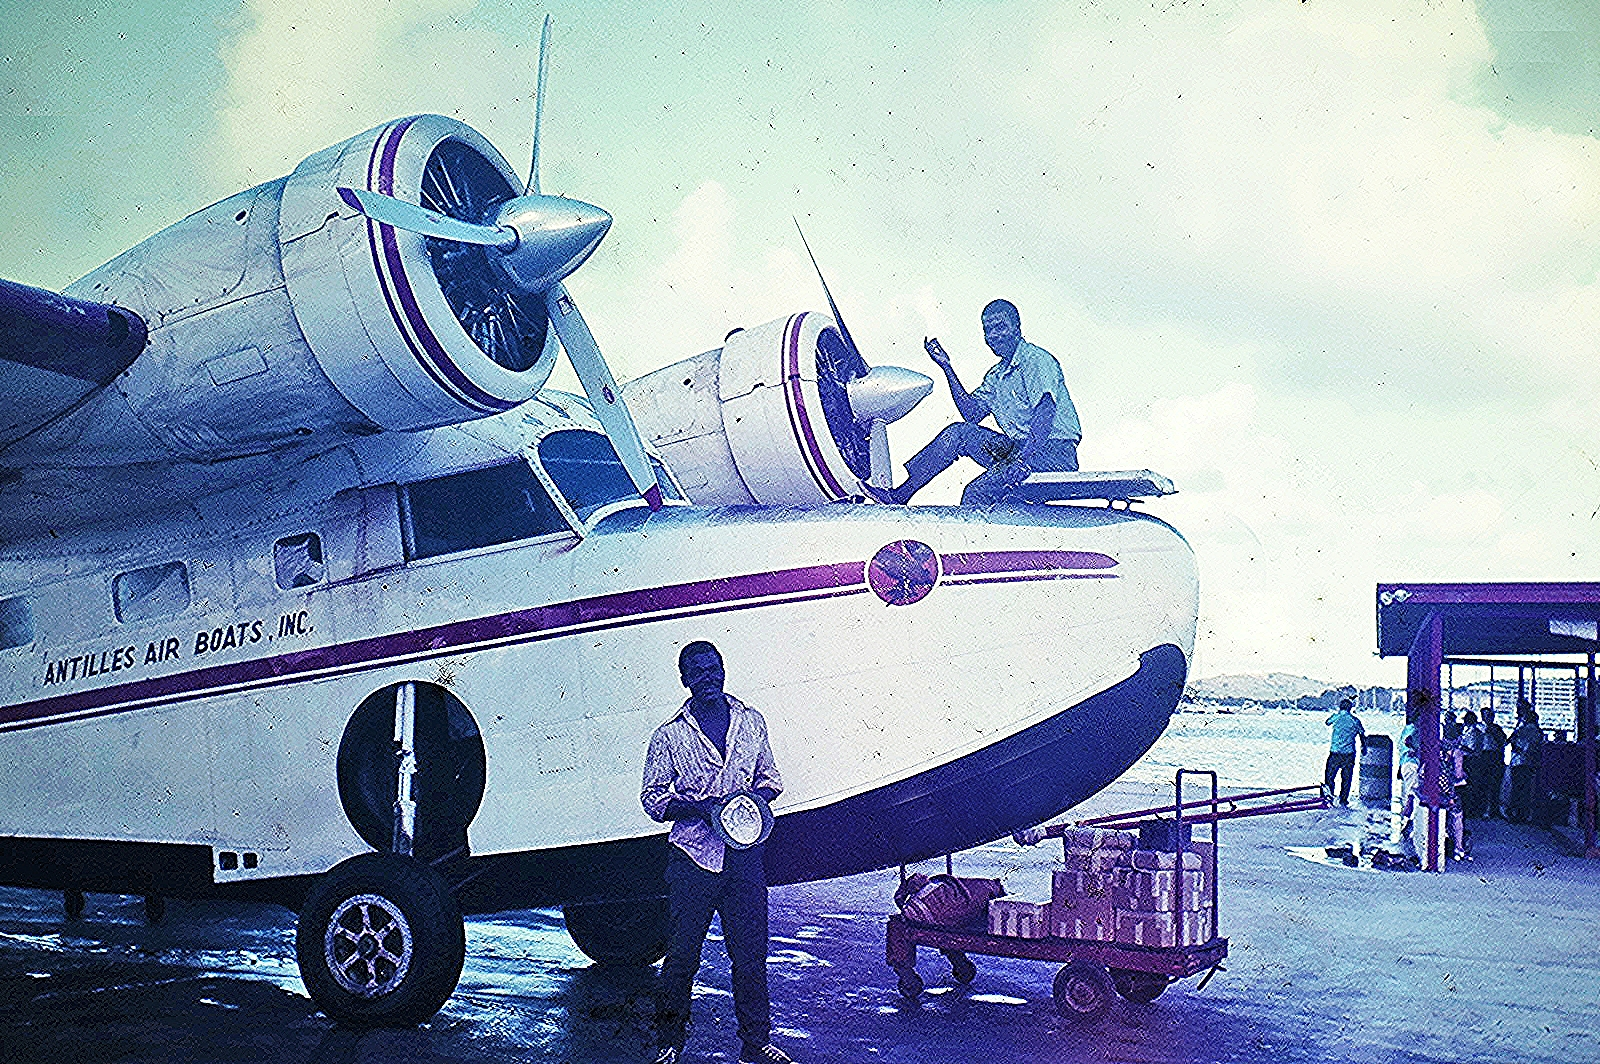 Antilles Grumman Goose - 044a